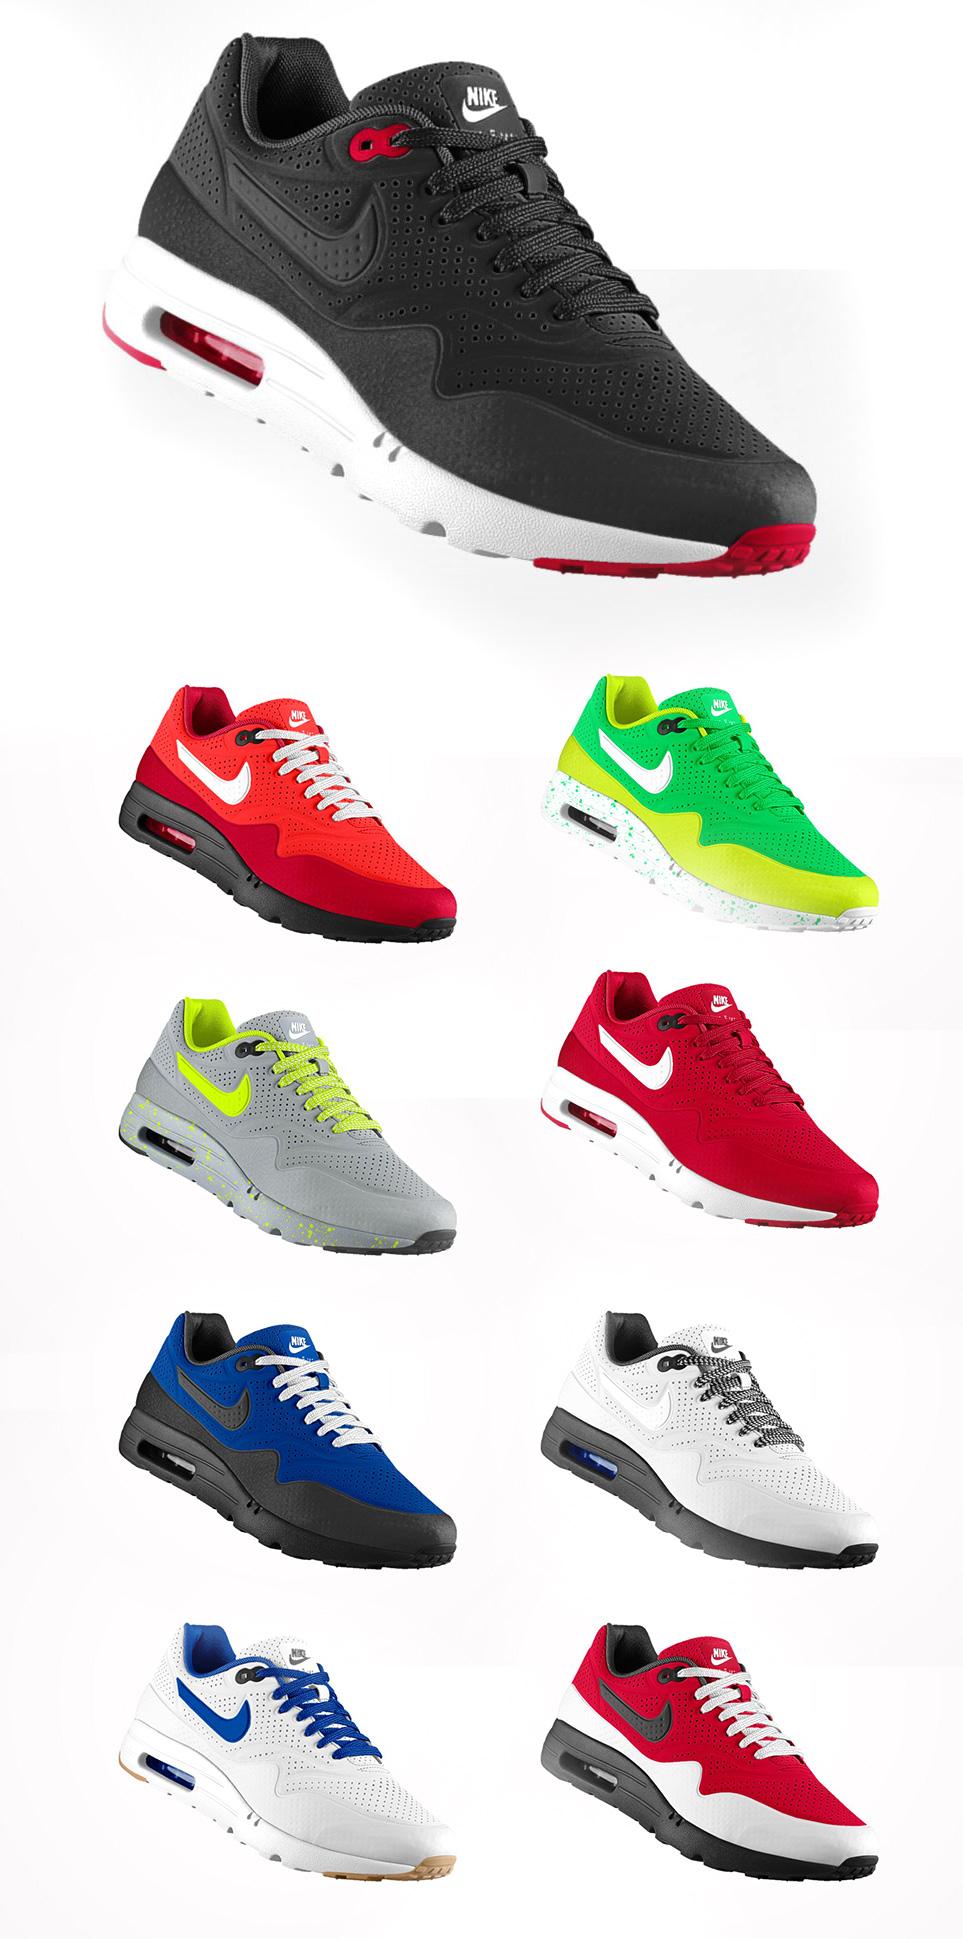 Sko Free Egen Design Din Nike wIAABxzq